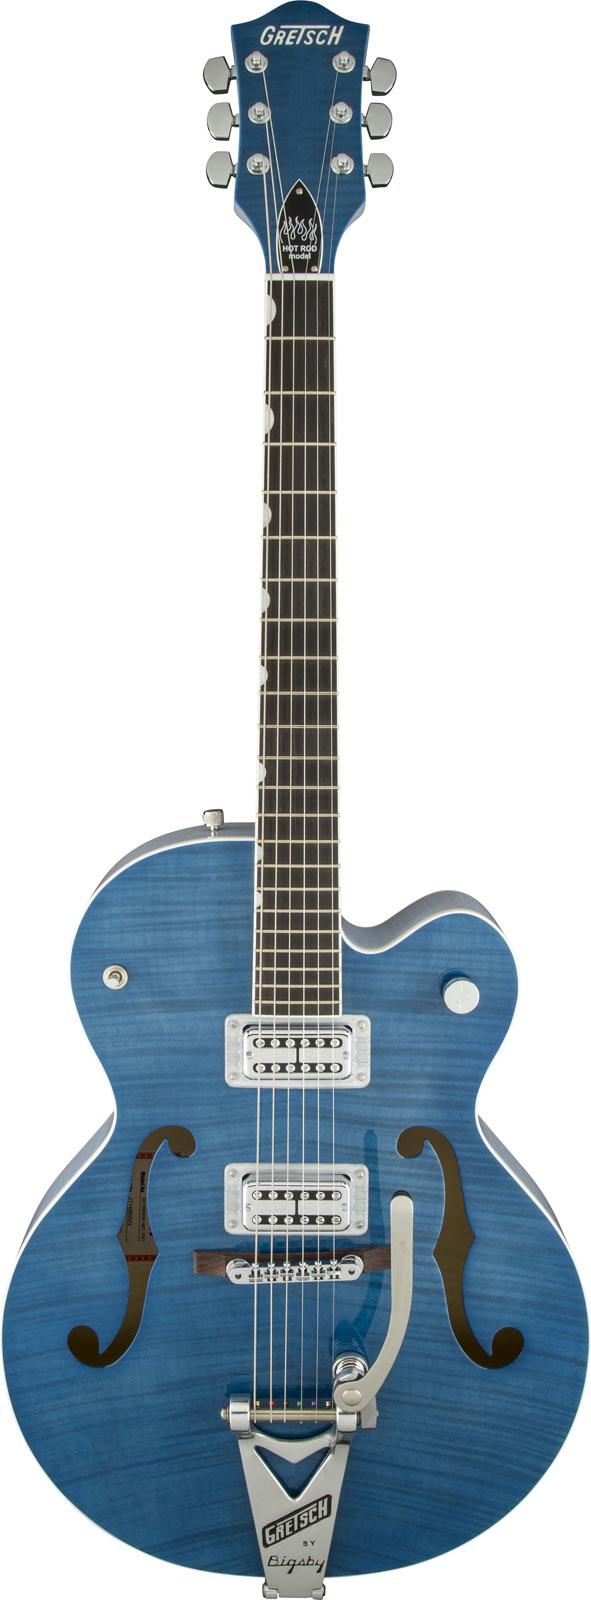 Gretsch G6120sh Setzer Hot Rod Tv Jones Setzer Signature Pickups Harbor Blue 2-tone + Etui